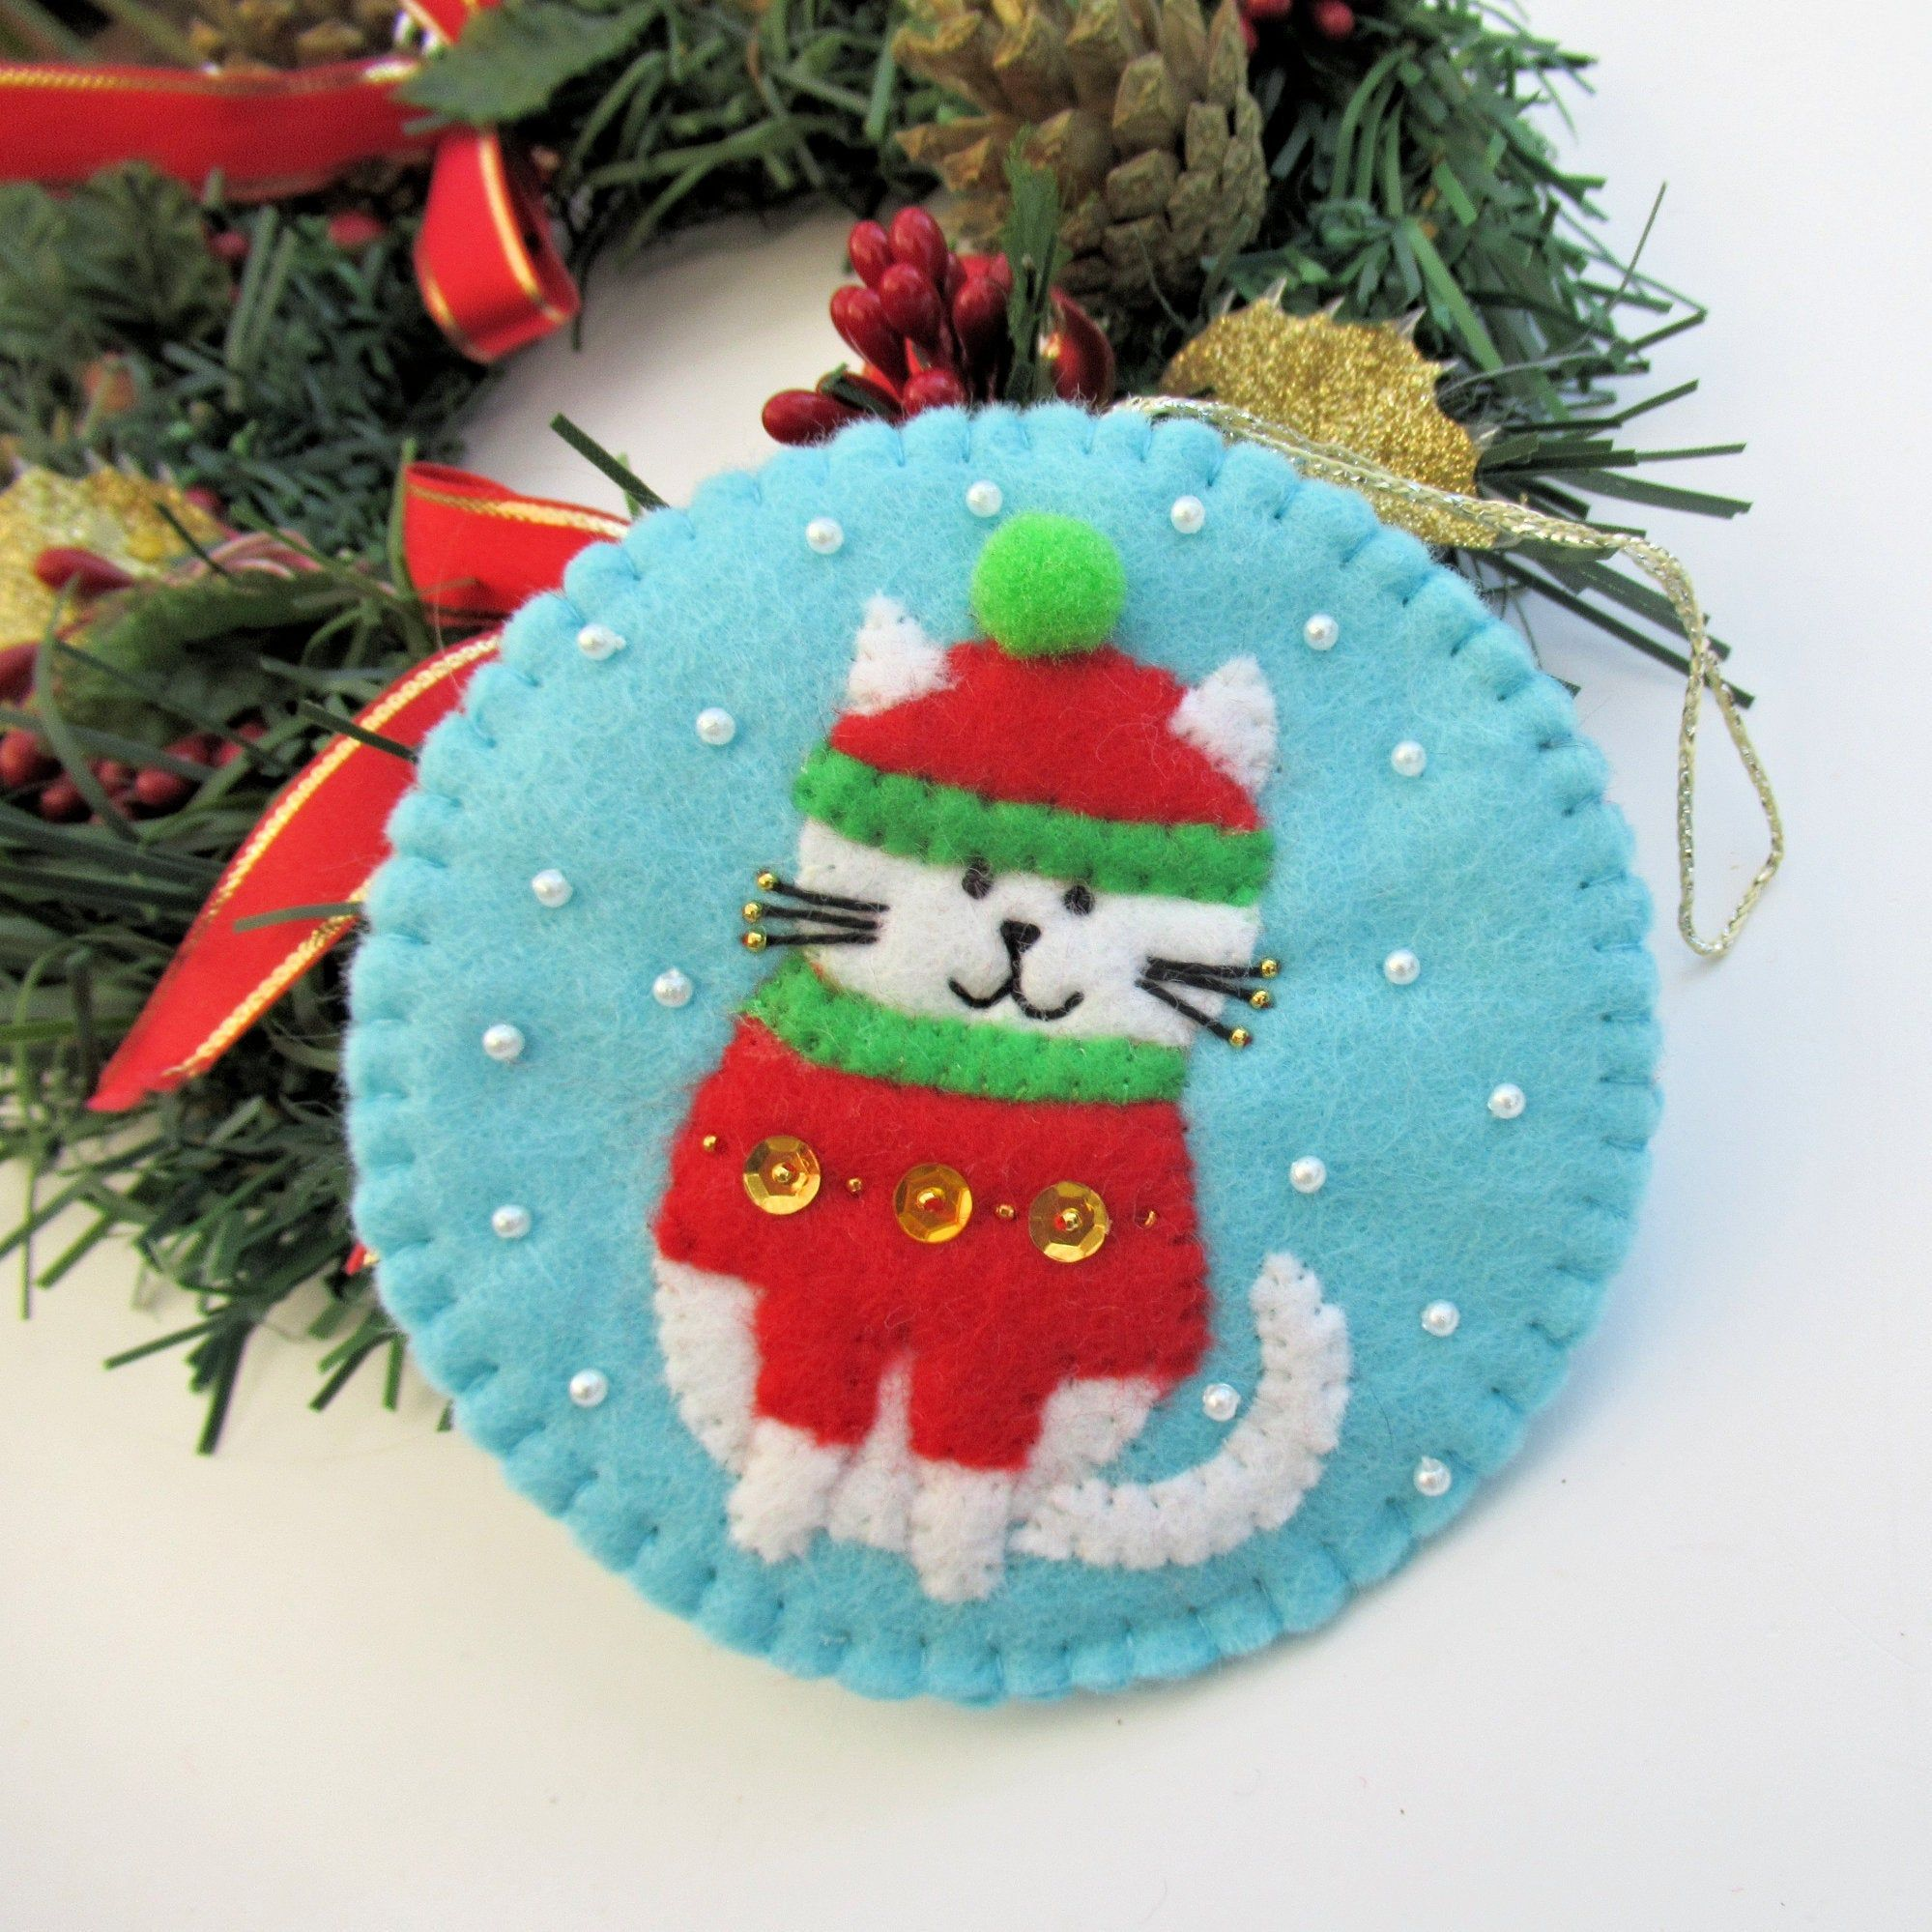 Cat Christmas Tree Felt Ornament Decoration Cat In Jumper And Etsy Felt Ornaments Felt Christmas Ornaments Diy Christmas Tree Ornaments